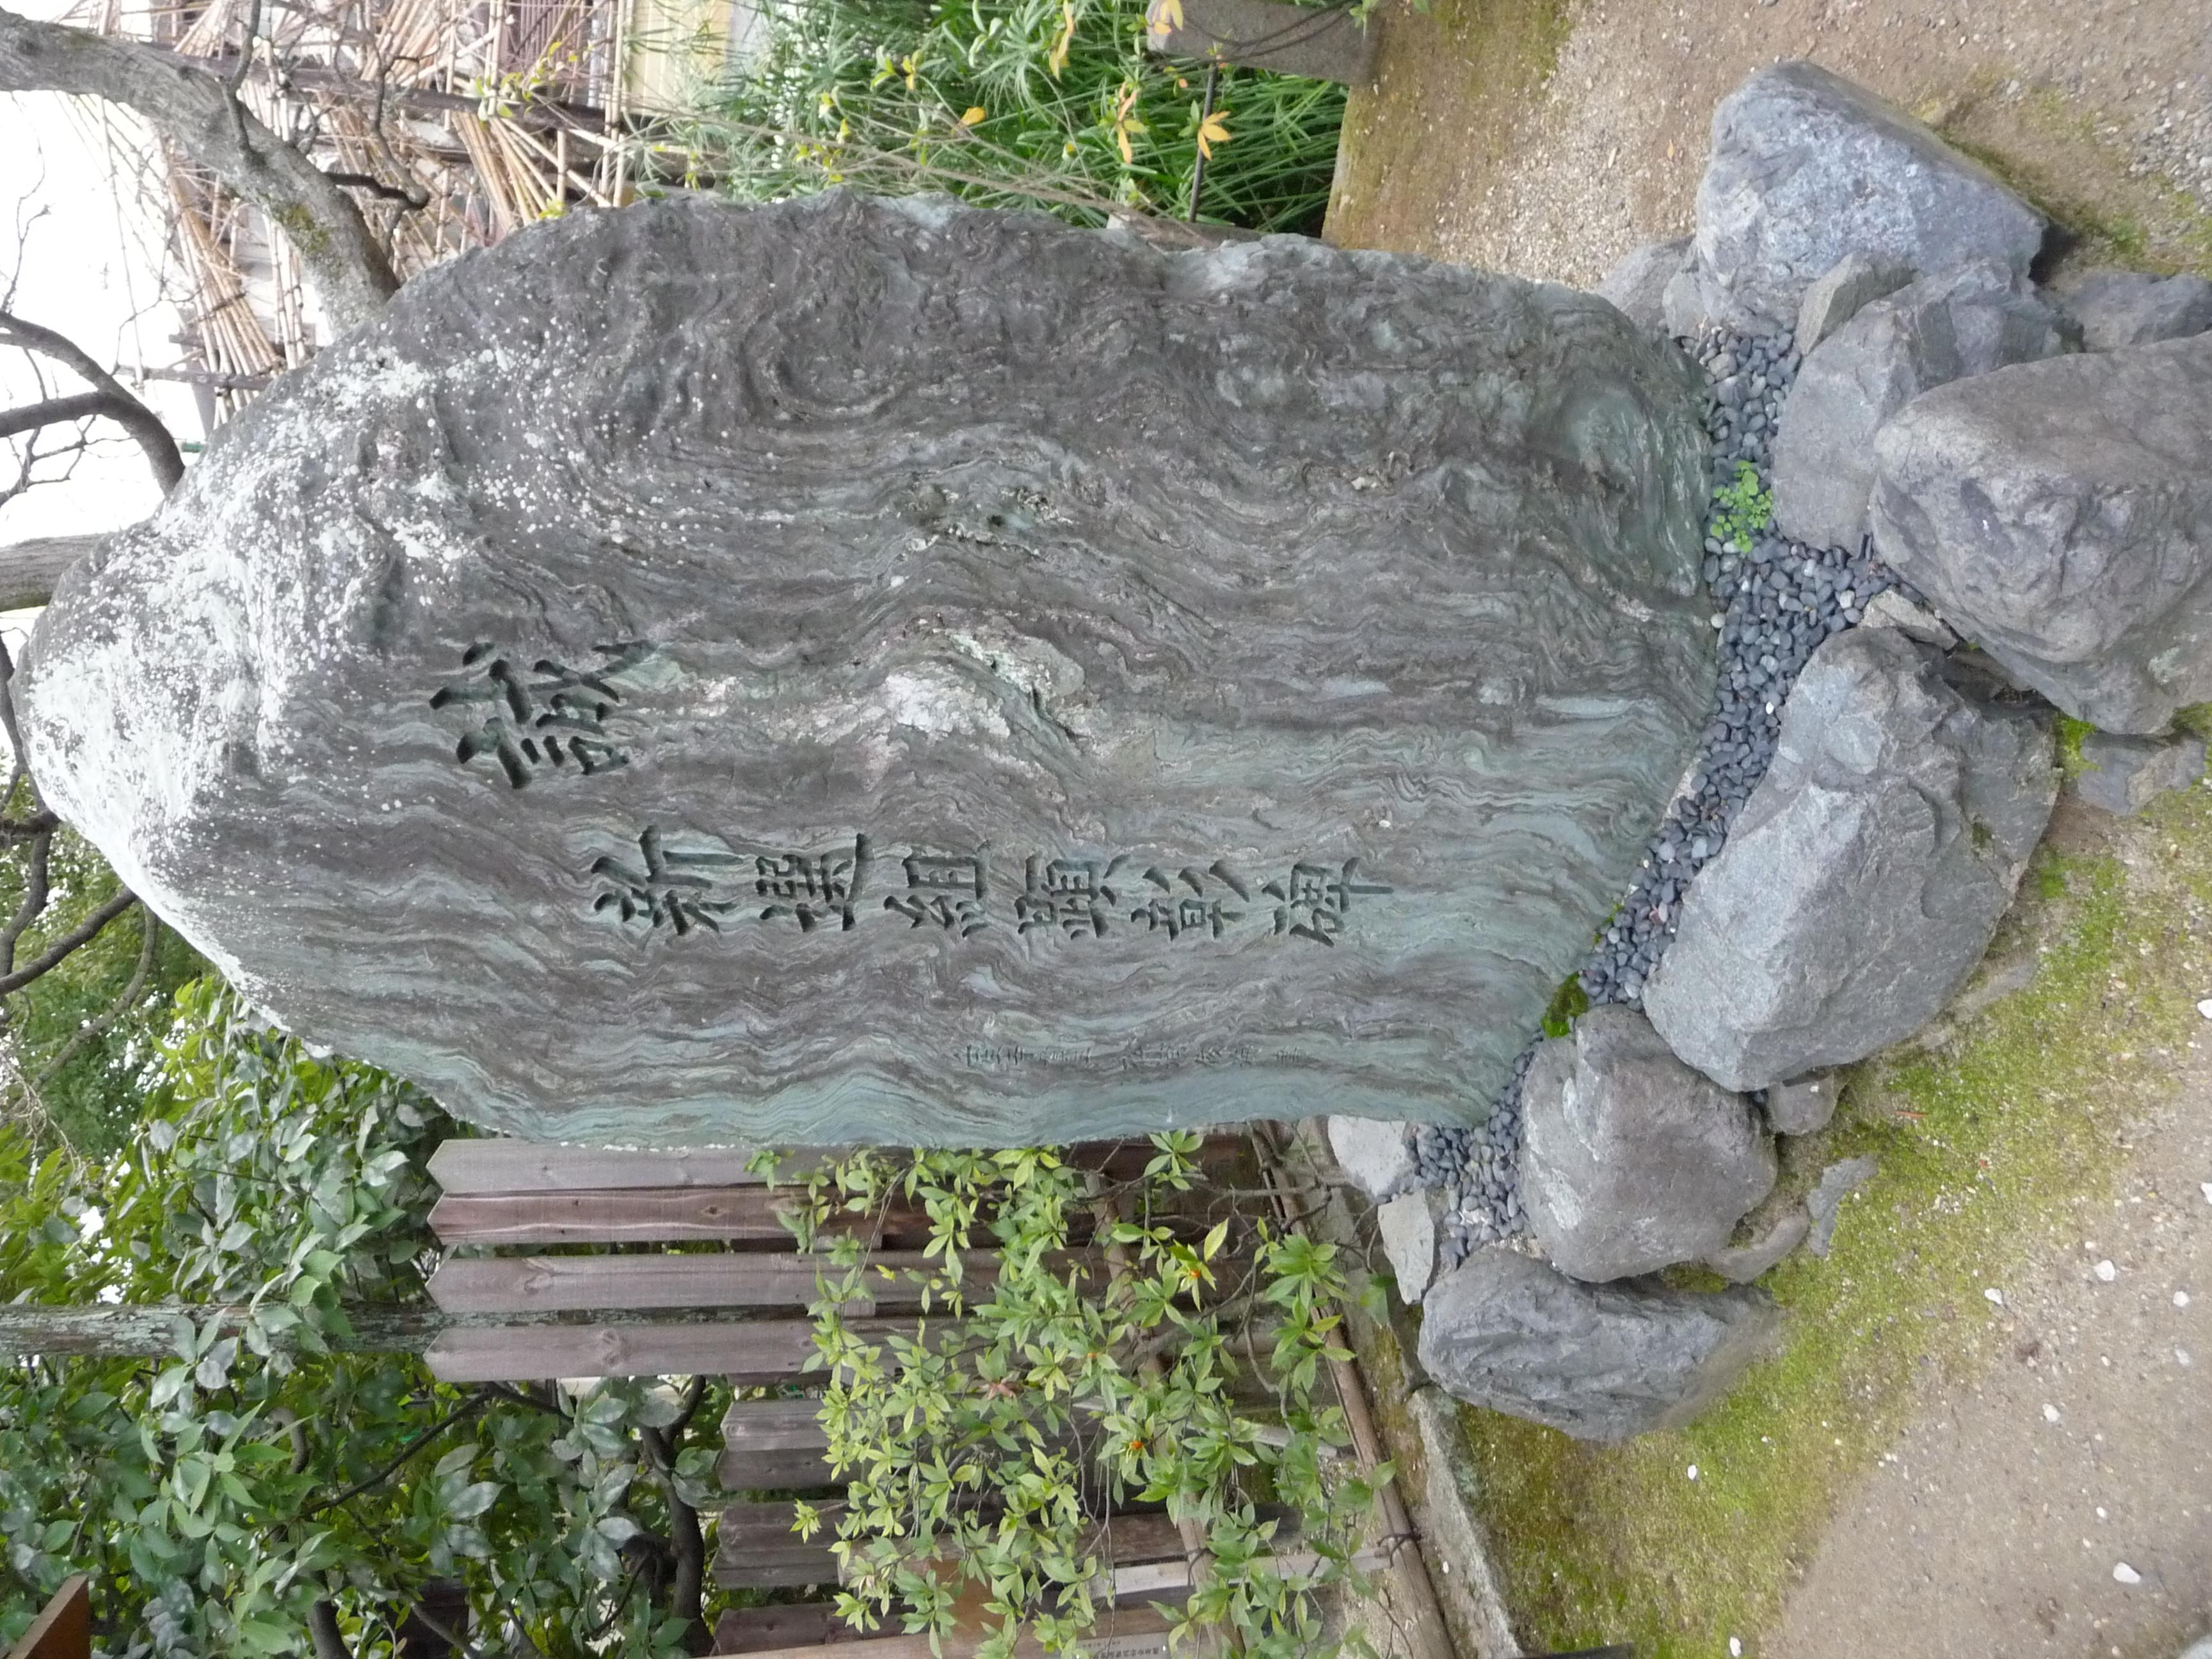 A Shinsegumi memorial